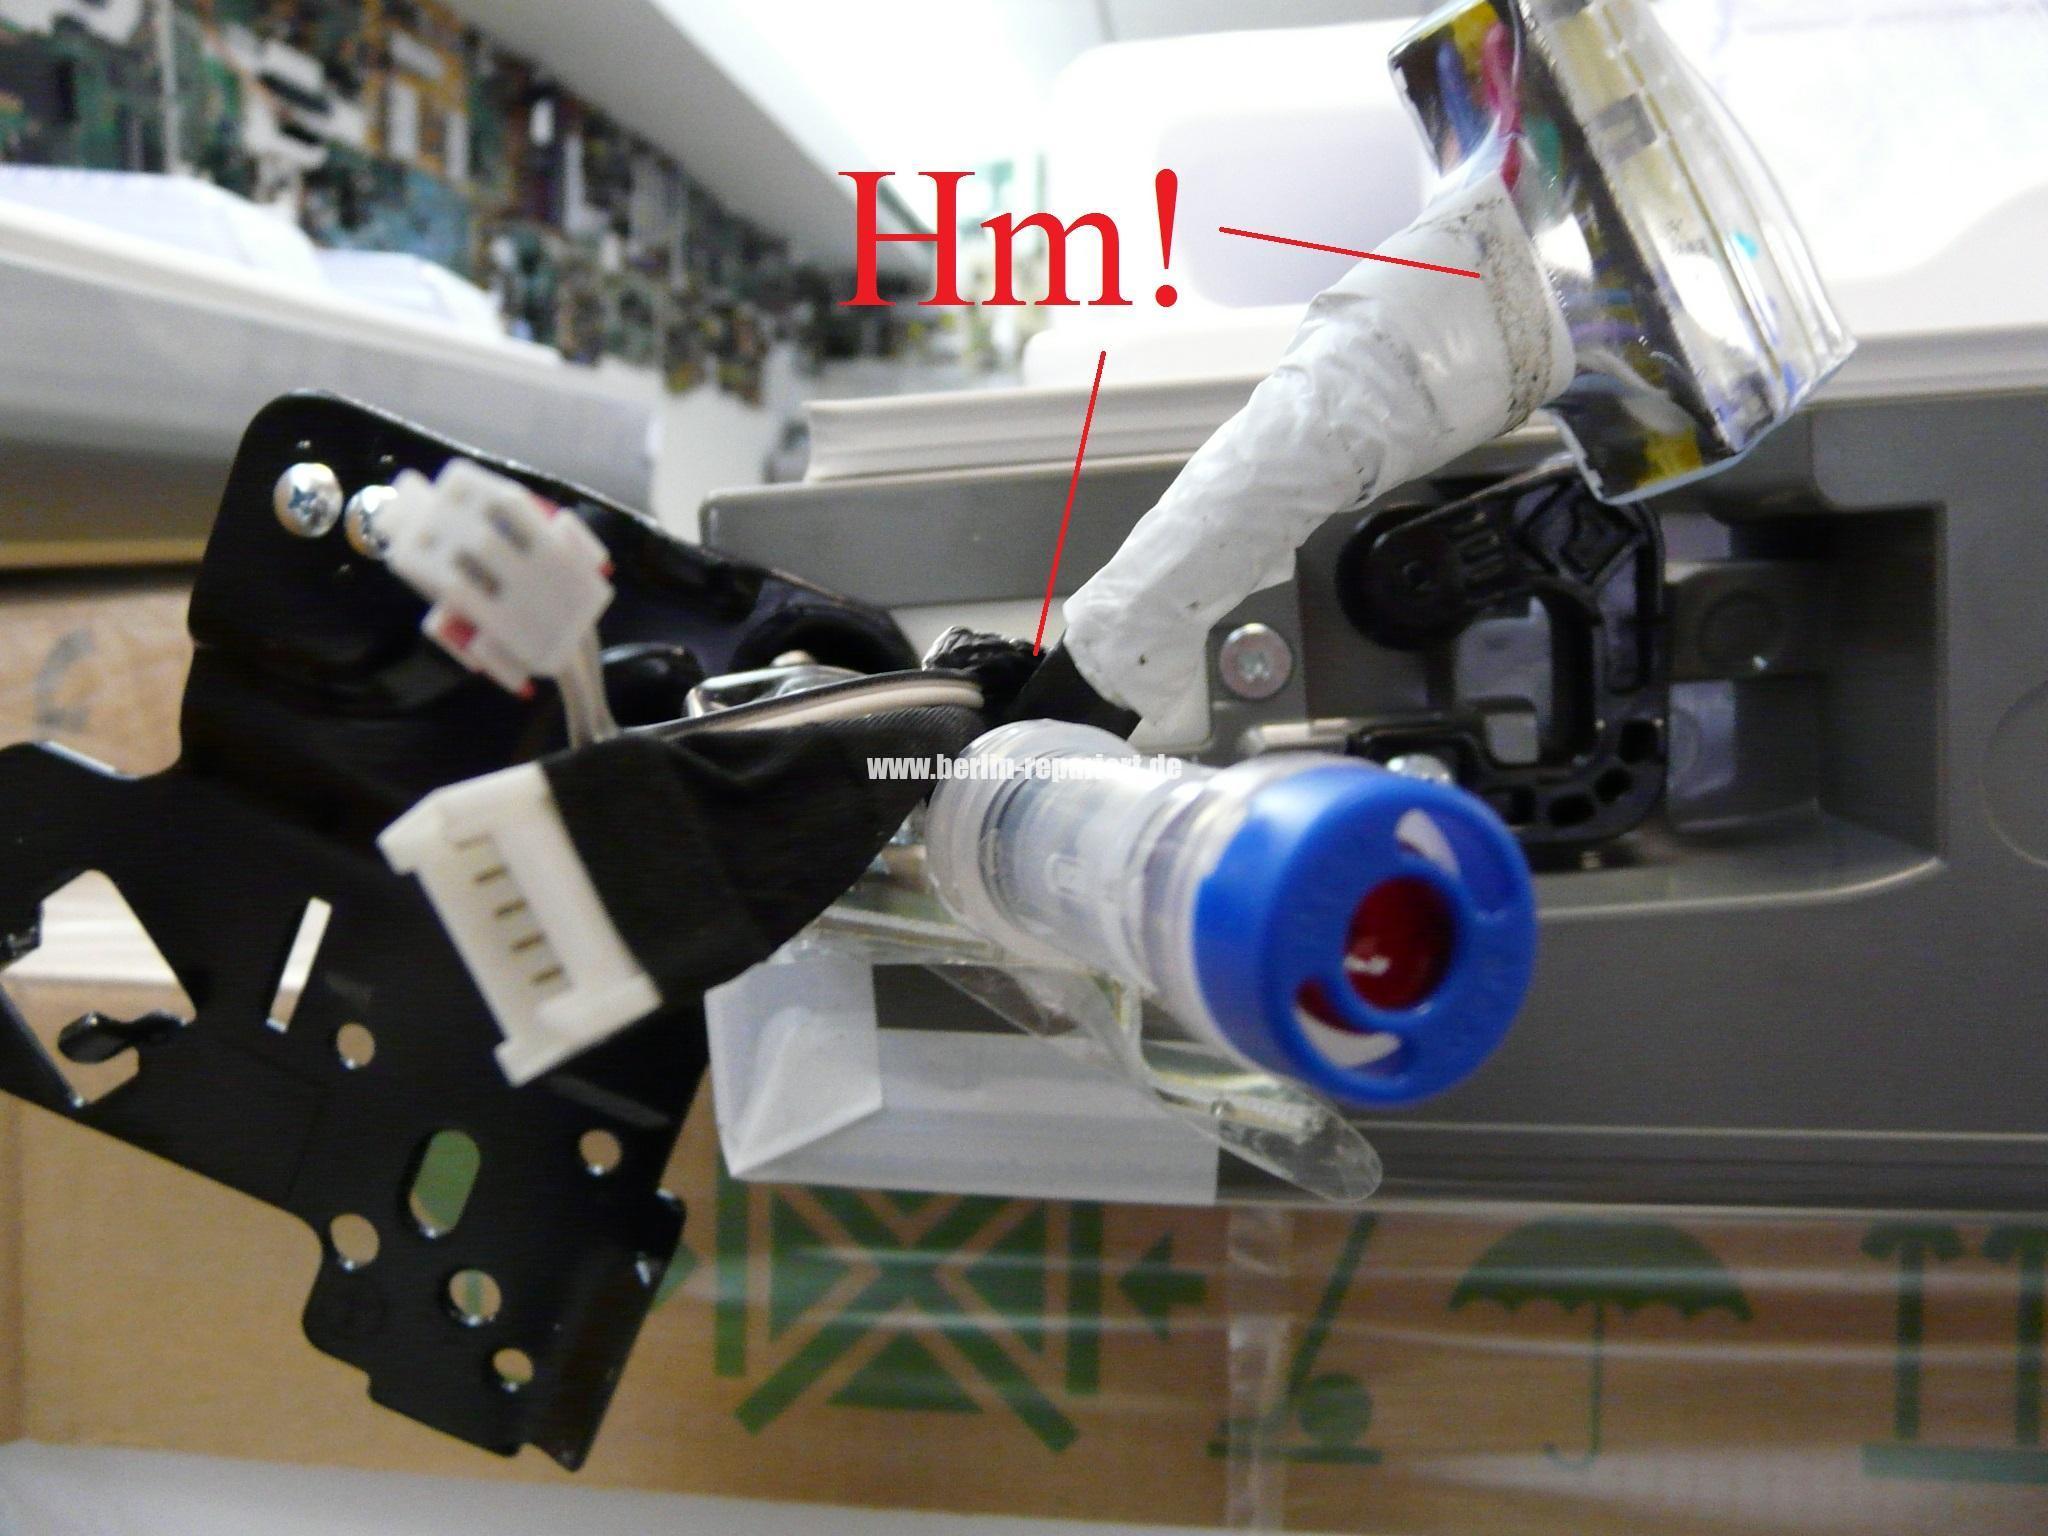 Red Bull Mini Kühlschrank Bedienungsanleitung : Samsung khlschrank anleitung. simple samsung khlschrank anleitung